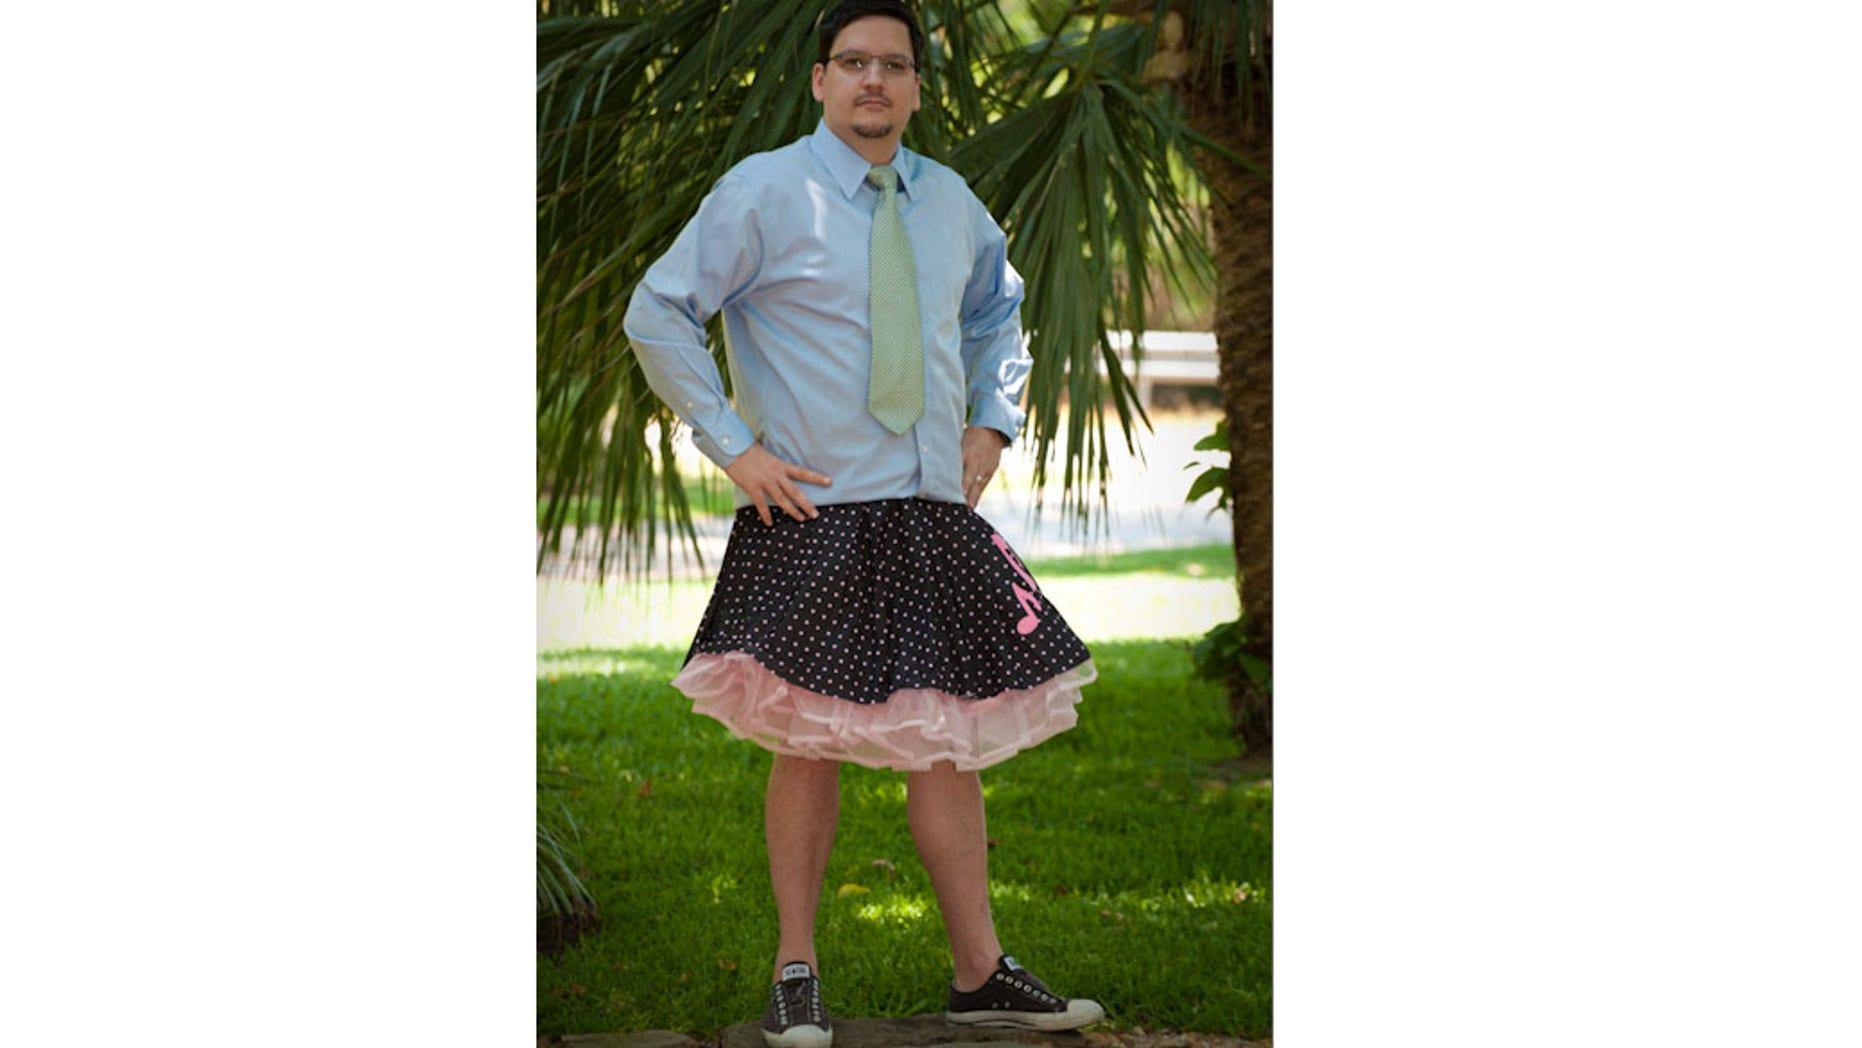 Manny Ruiz, the Papiblogger